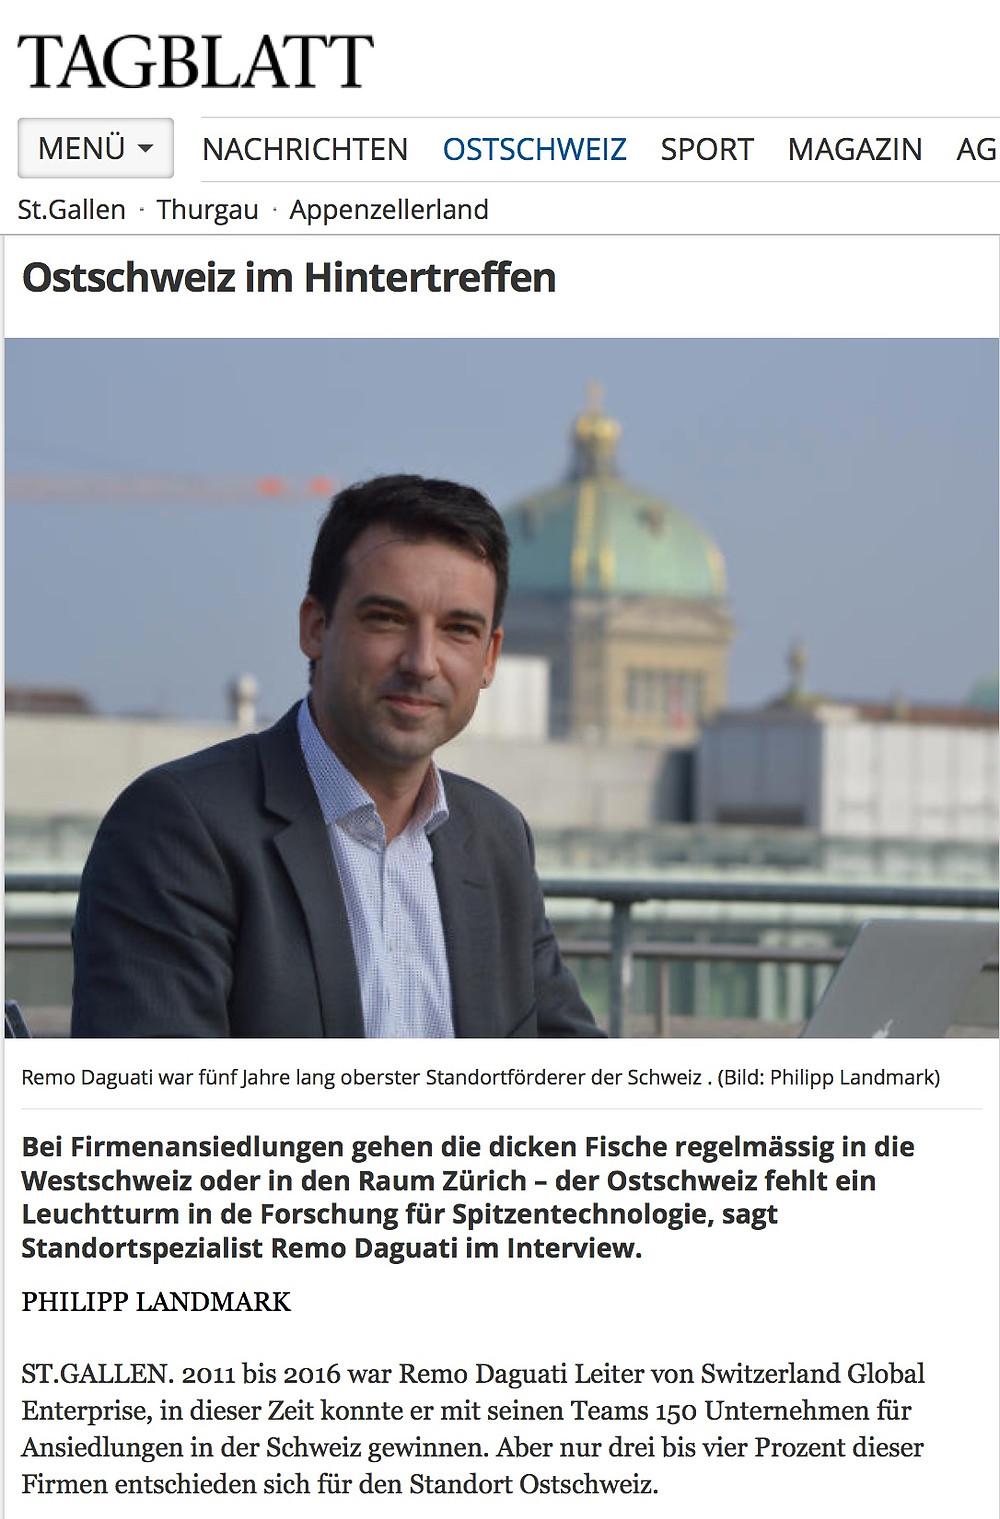 Remo Daguati LOC Tagblatt Ostschweiz im Hintertreffen